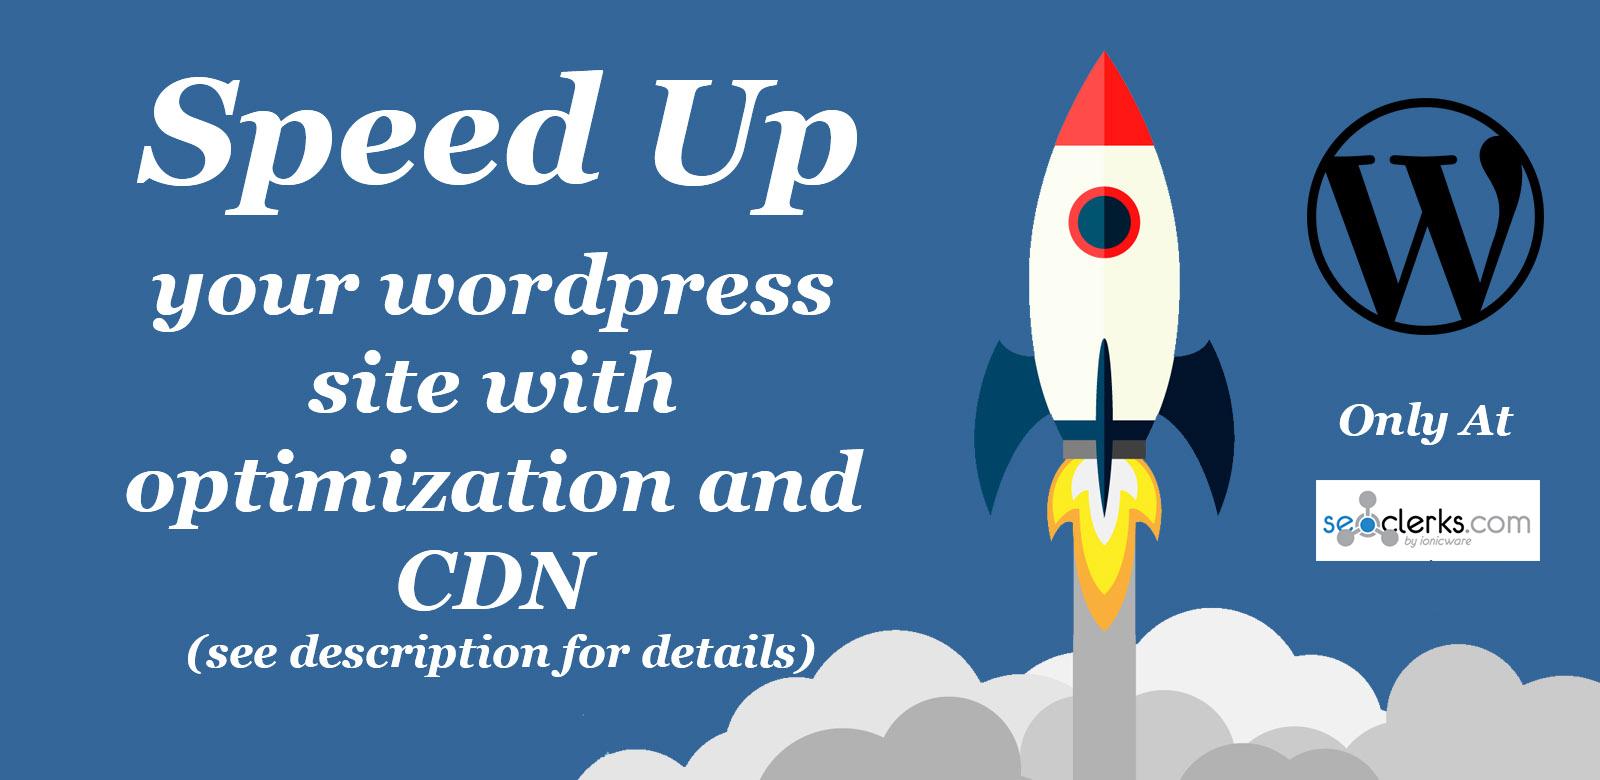 Make your wordpress site fast